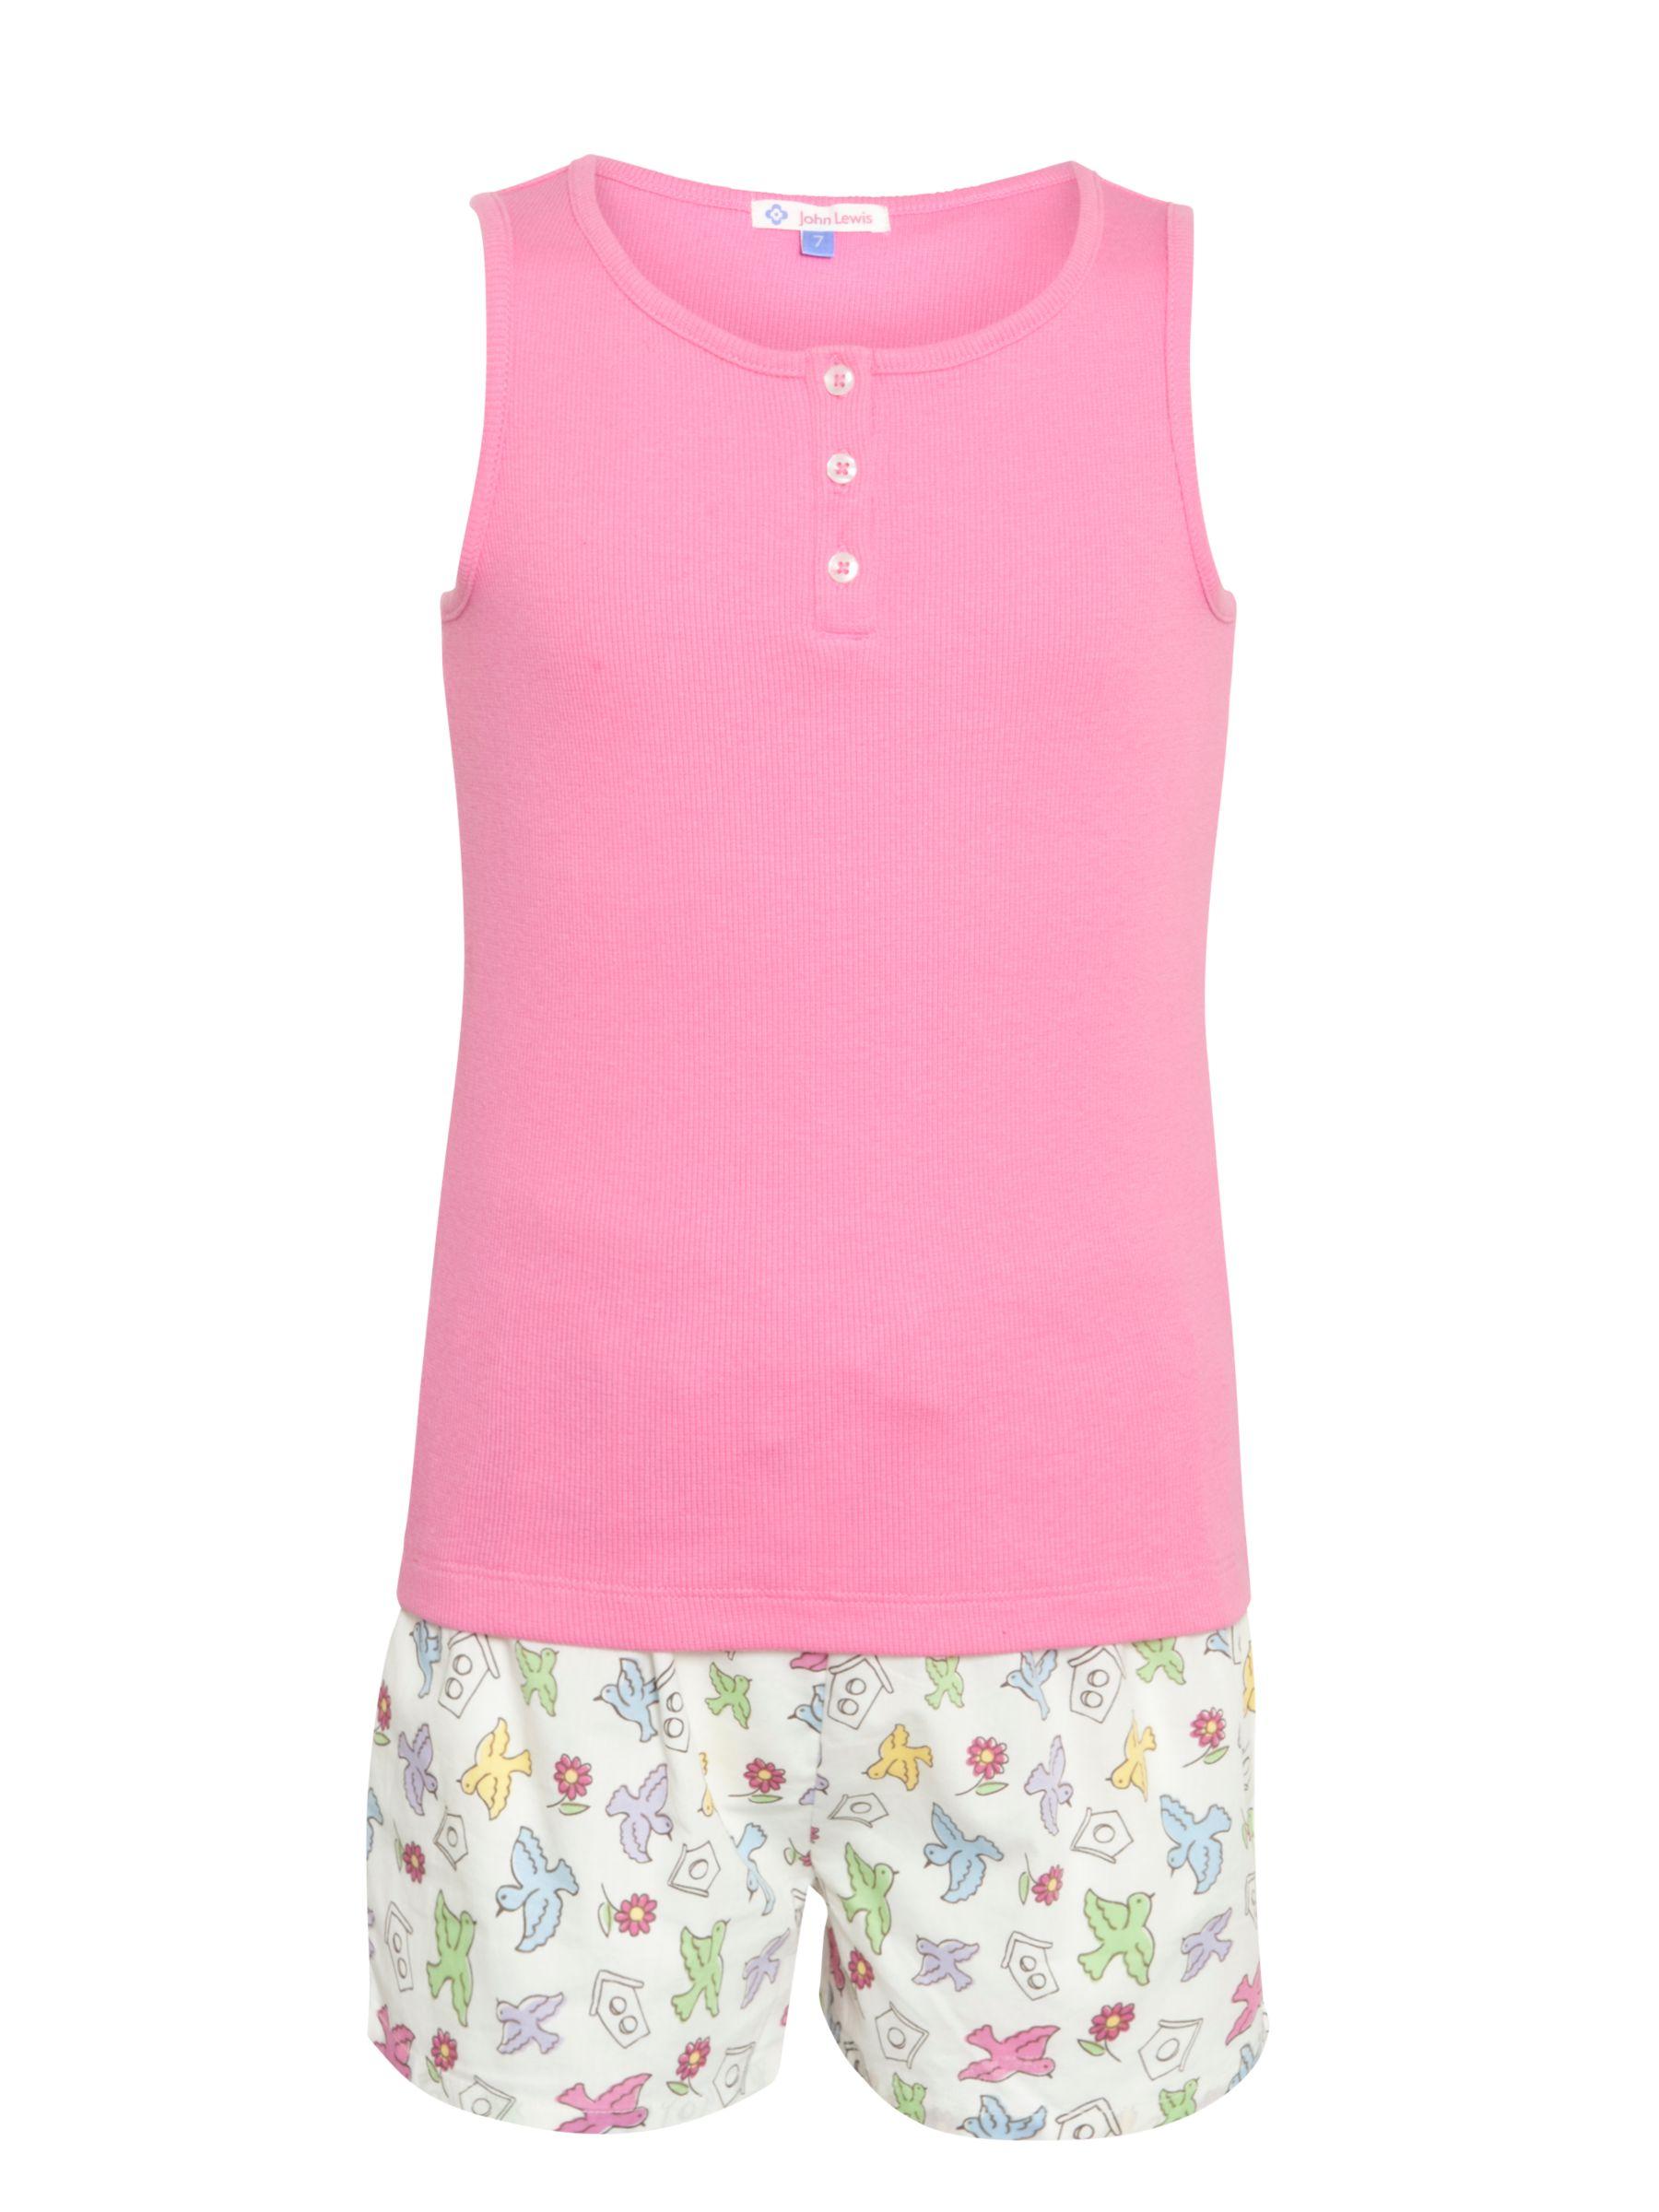 John Lewis Girl Birds Shortie Pyjamas, Pink/Multi